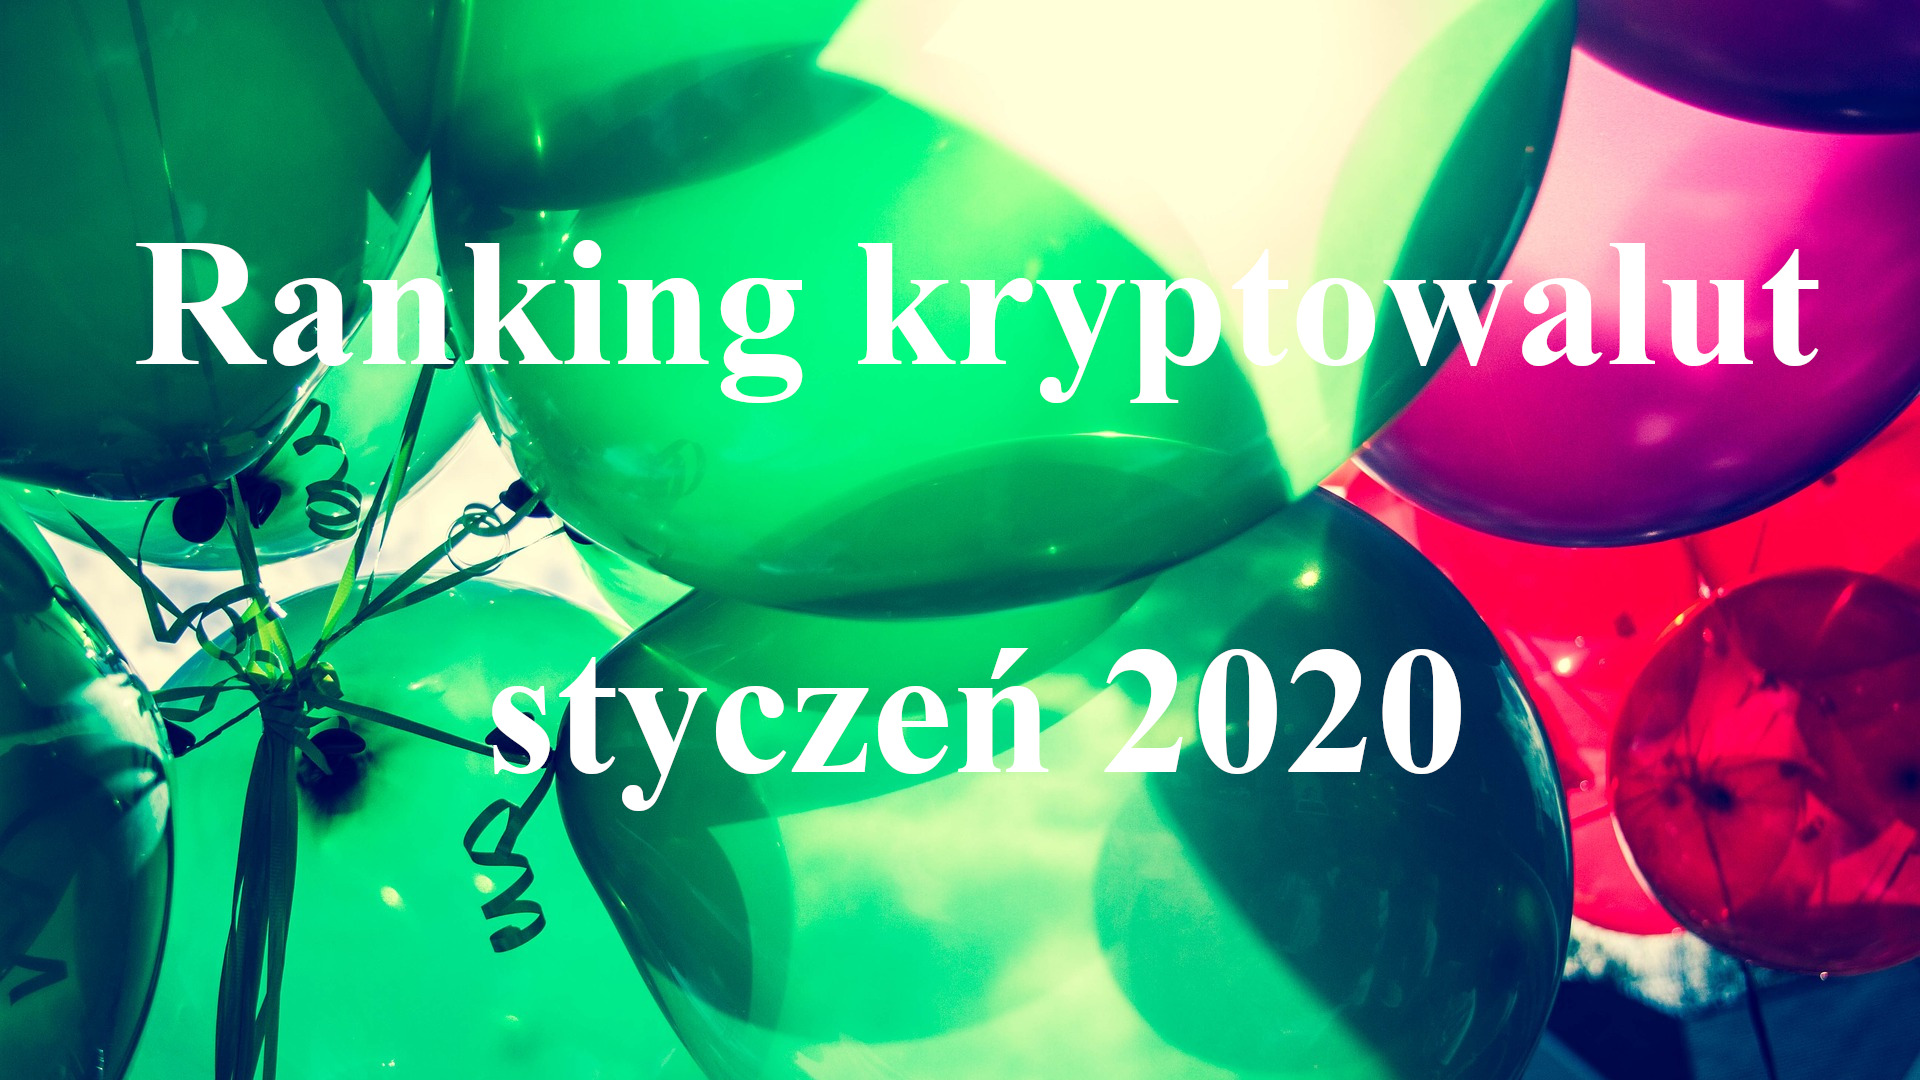 ranking krypto styczeń 2020